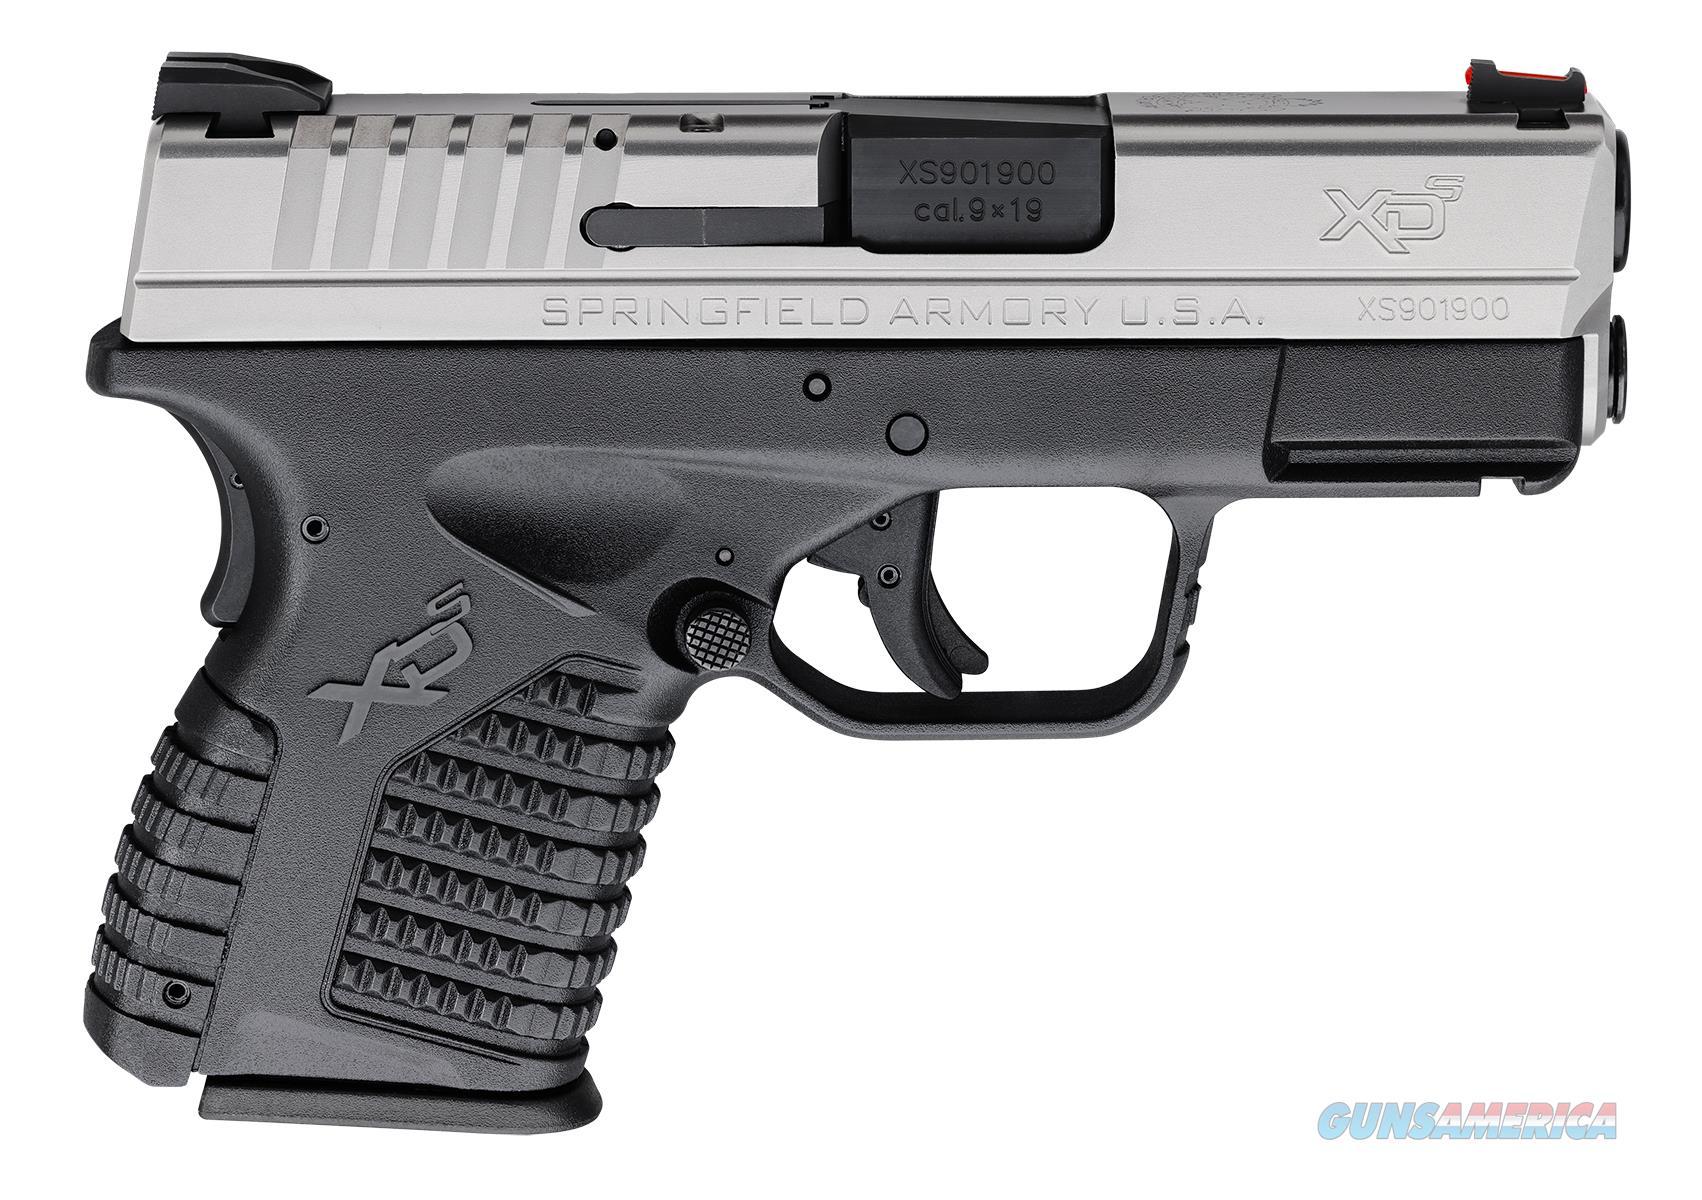 "Springfield XD-S 9mm 3.3"" 7+1/8+1 - New in Case  Guns > Pistols > Springfield Armory Pistols > XD-S"